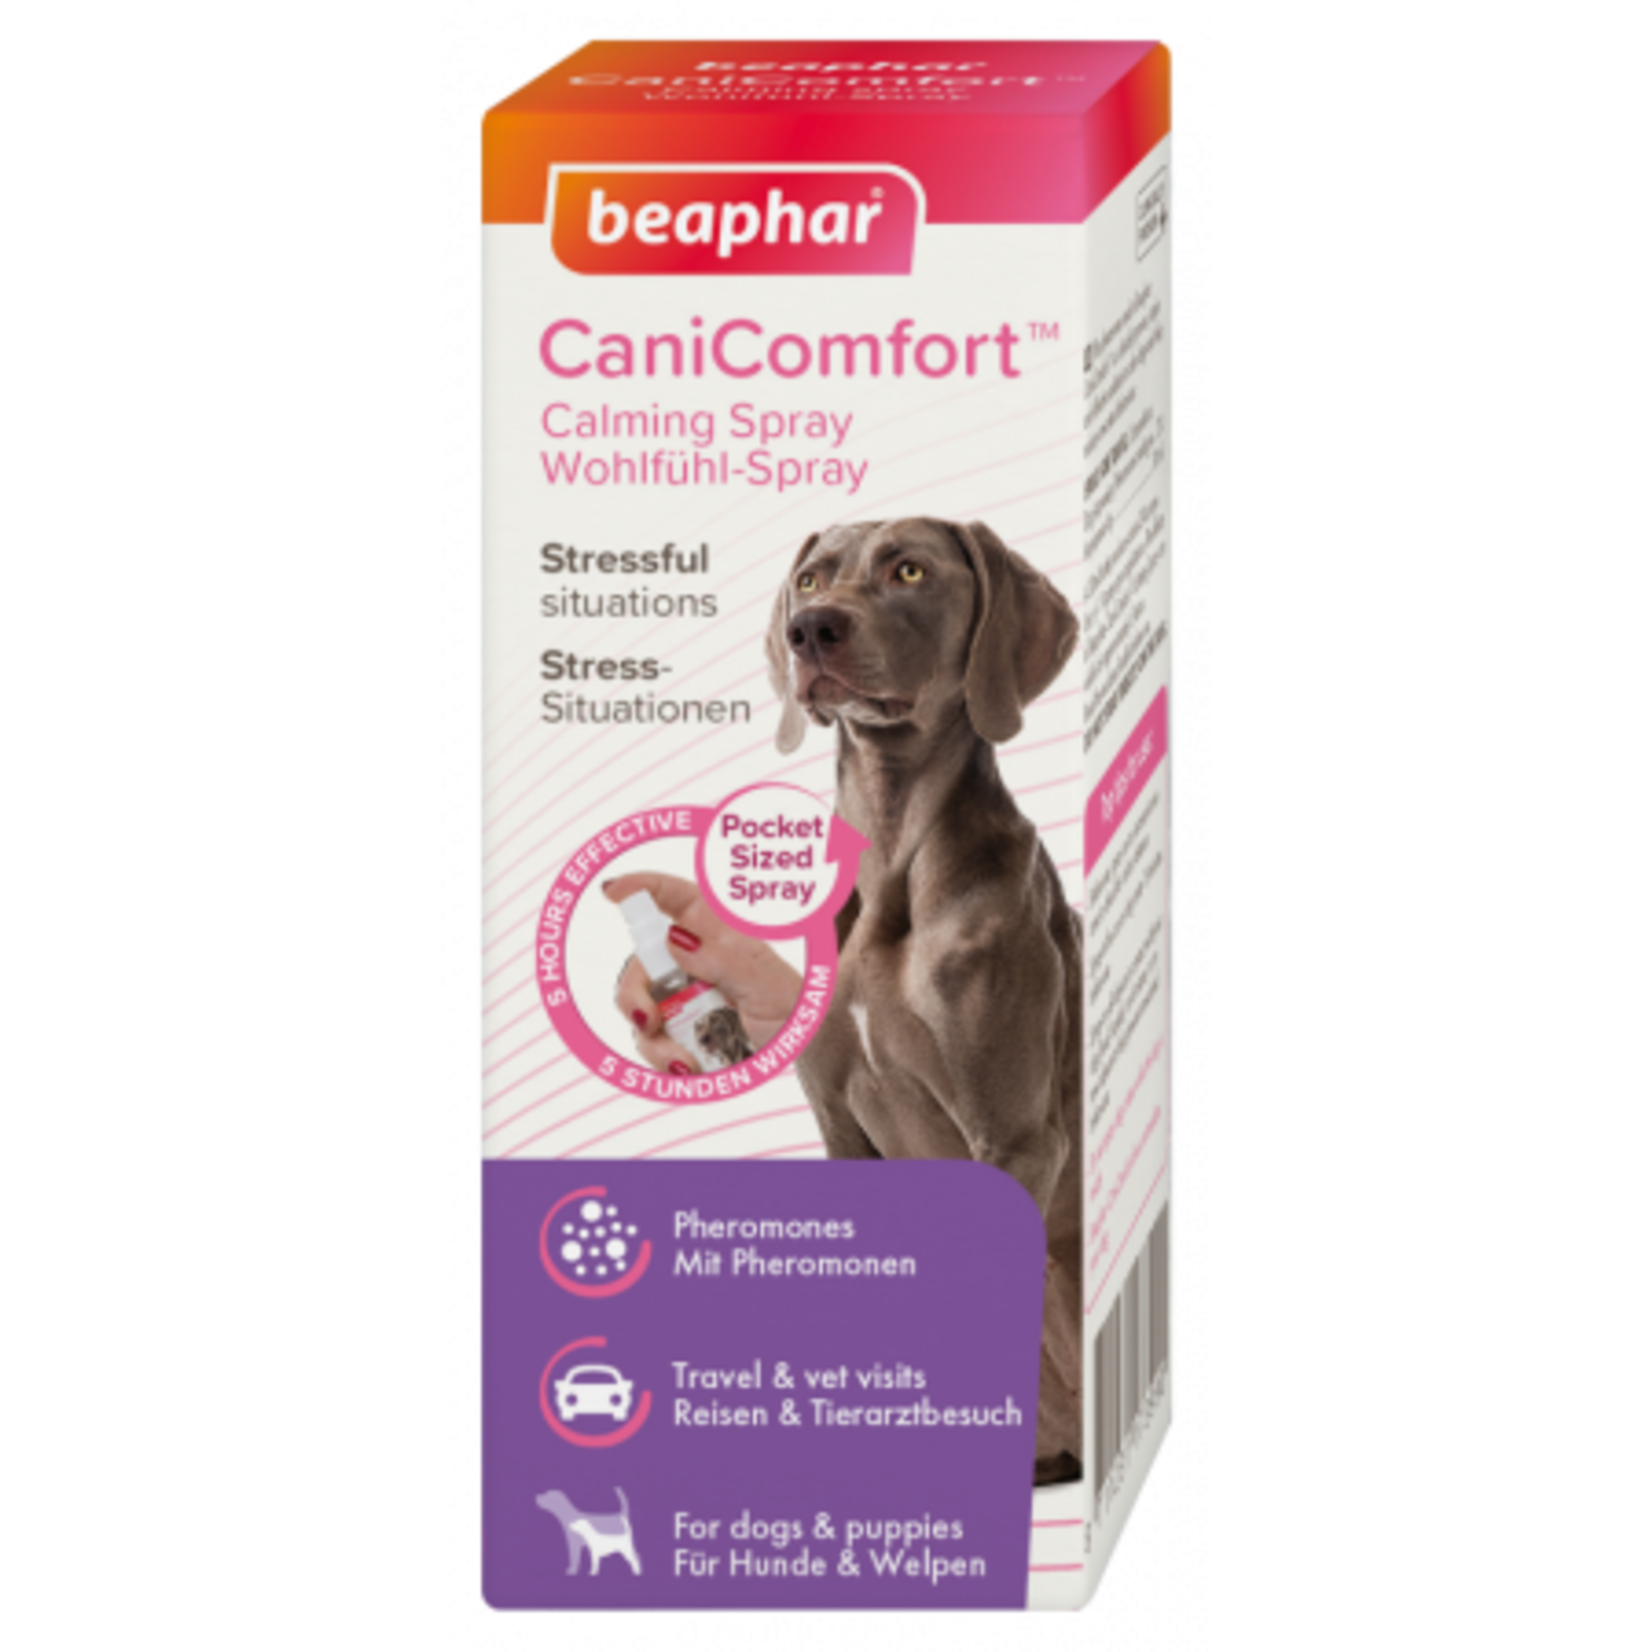 Beaphar CaniComfort Dog Calming Spray, 30ml